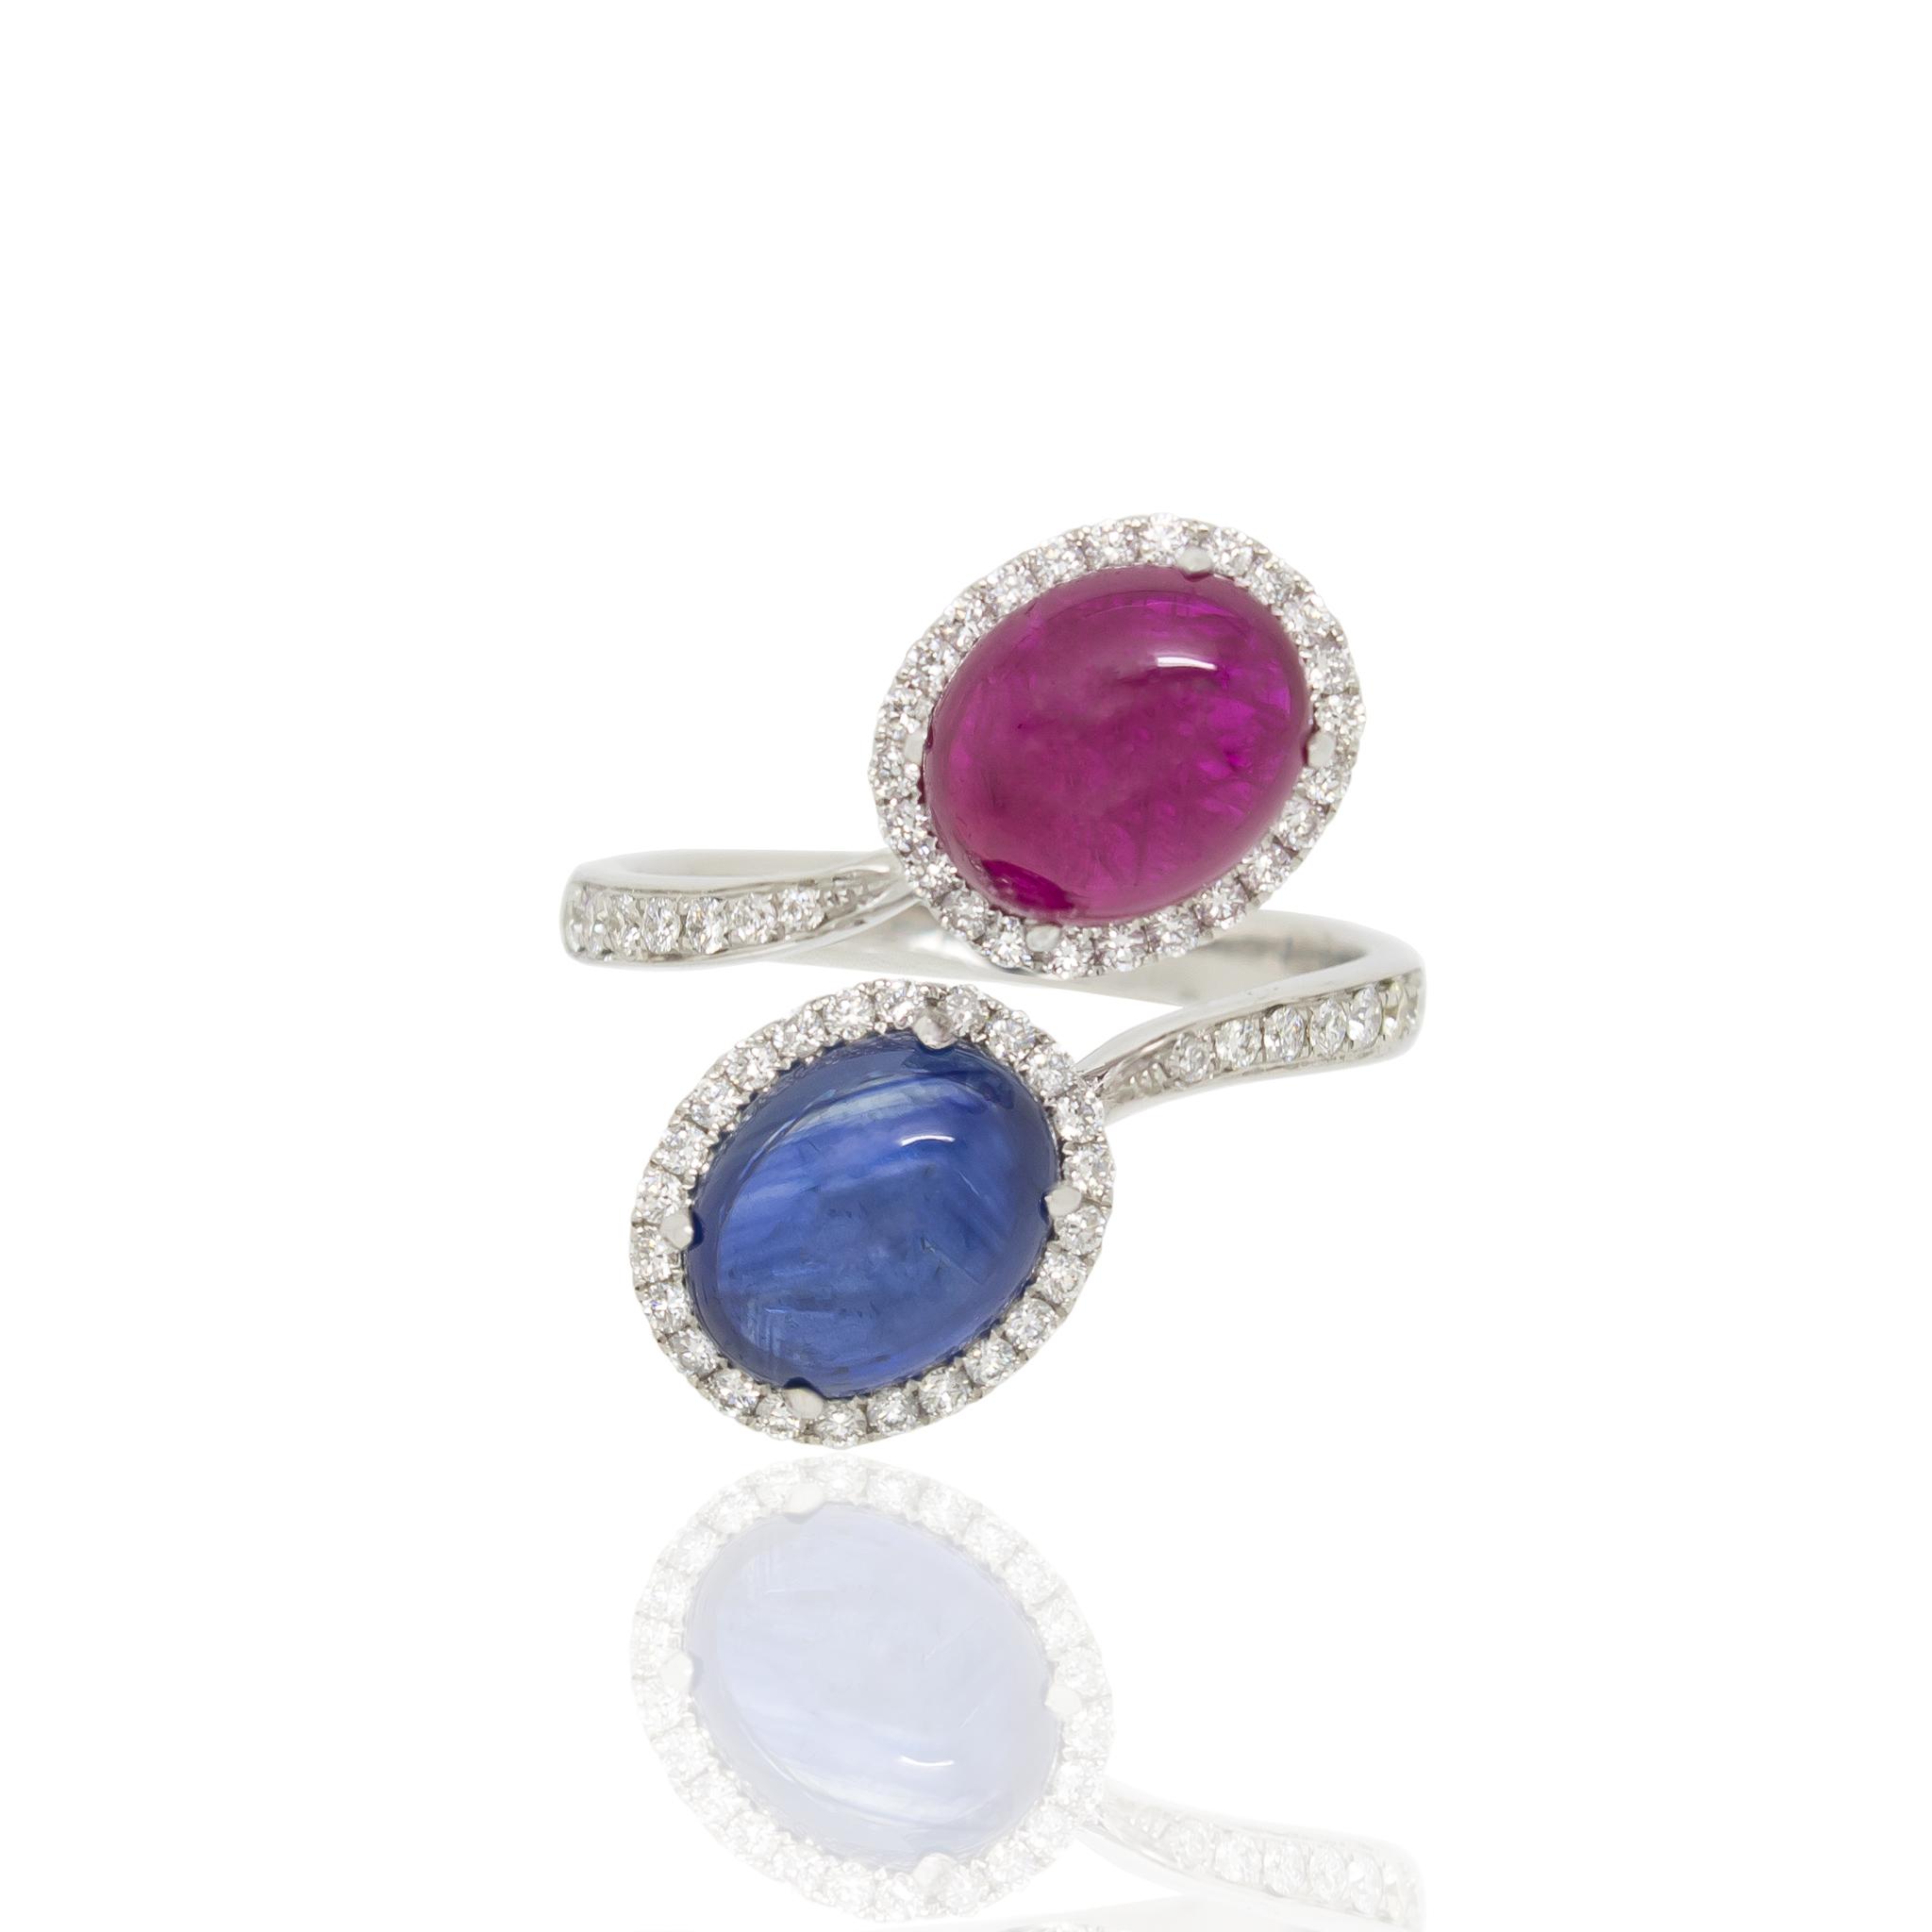 noxy dual stone ring web 2